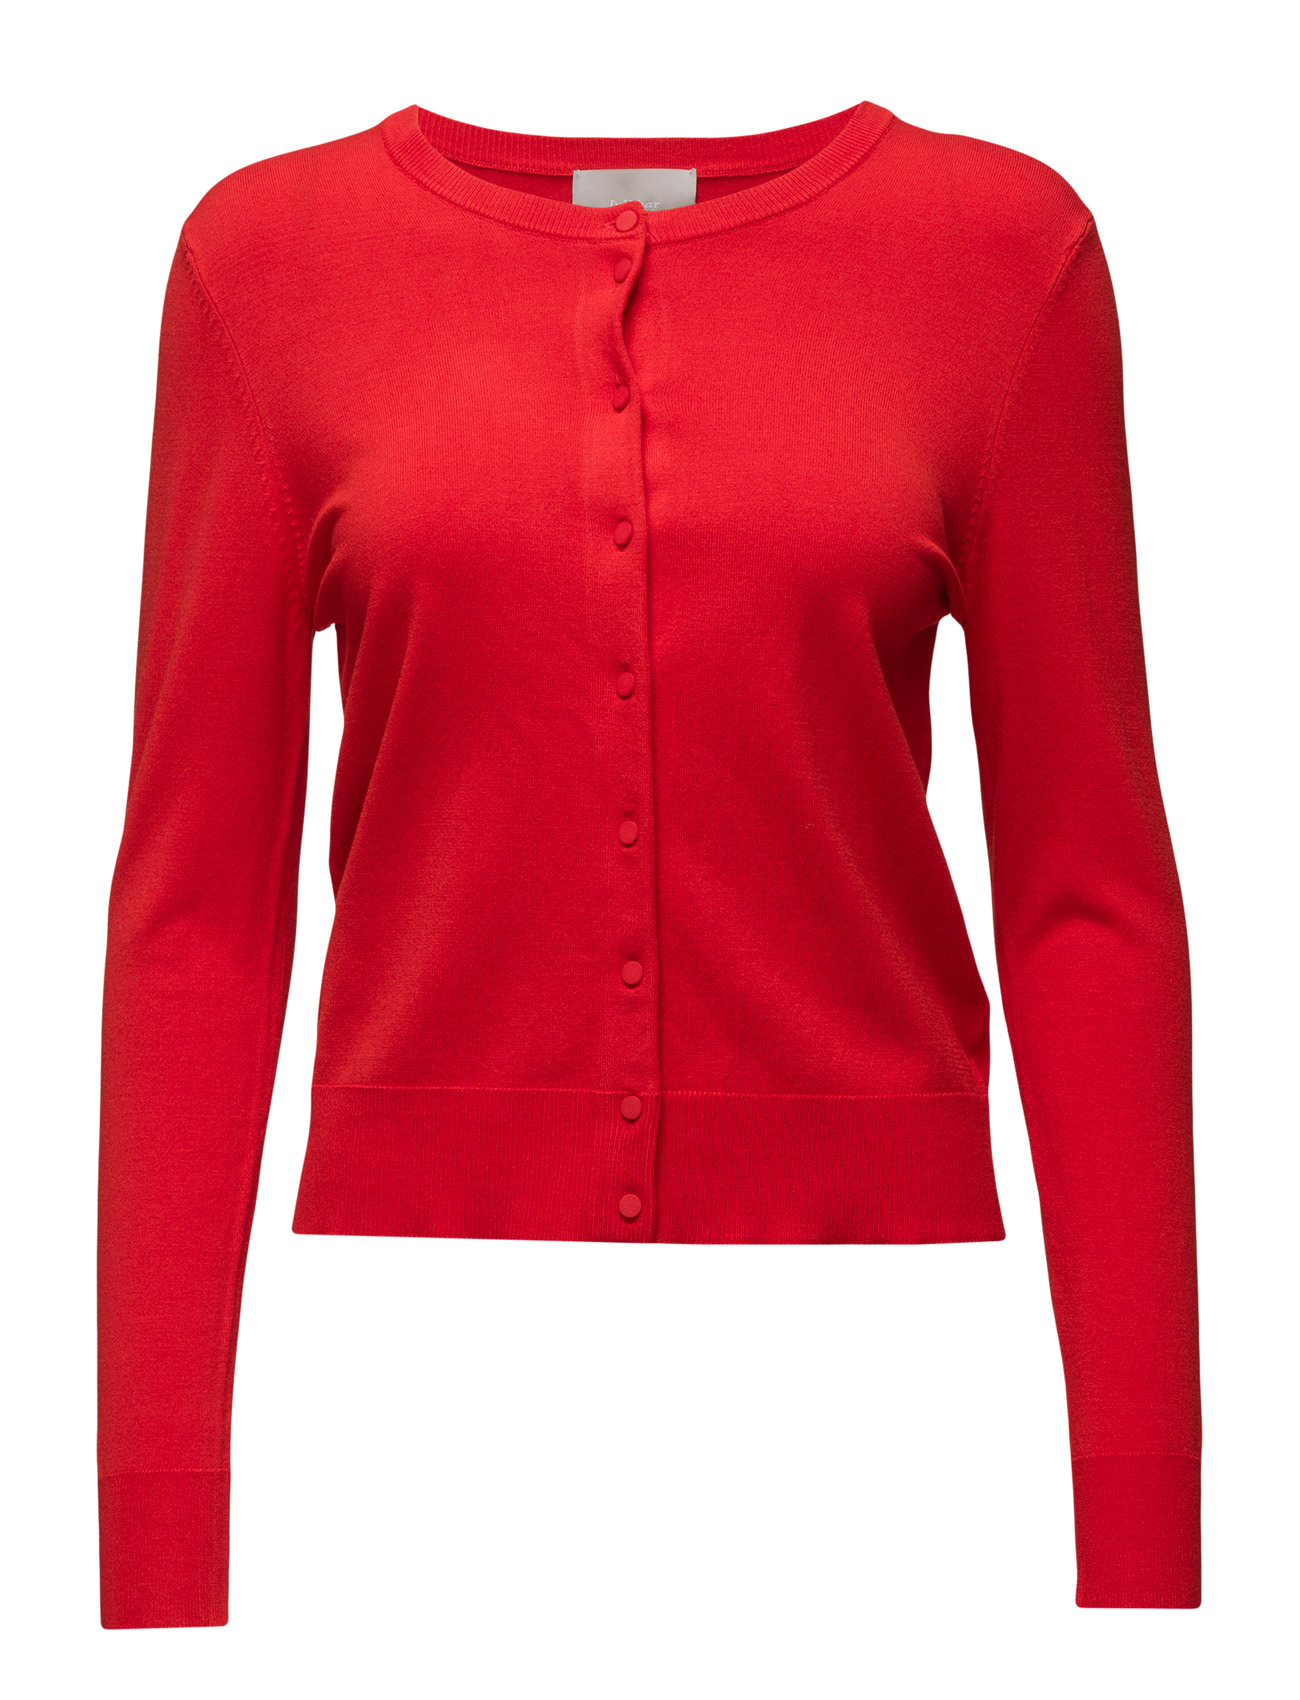 45e791b9 Rita Cardigan Knit InWear Cardigans til Damer i Fiery Red ...